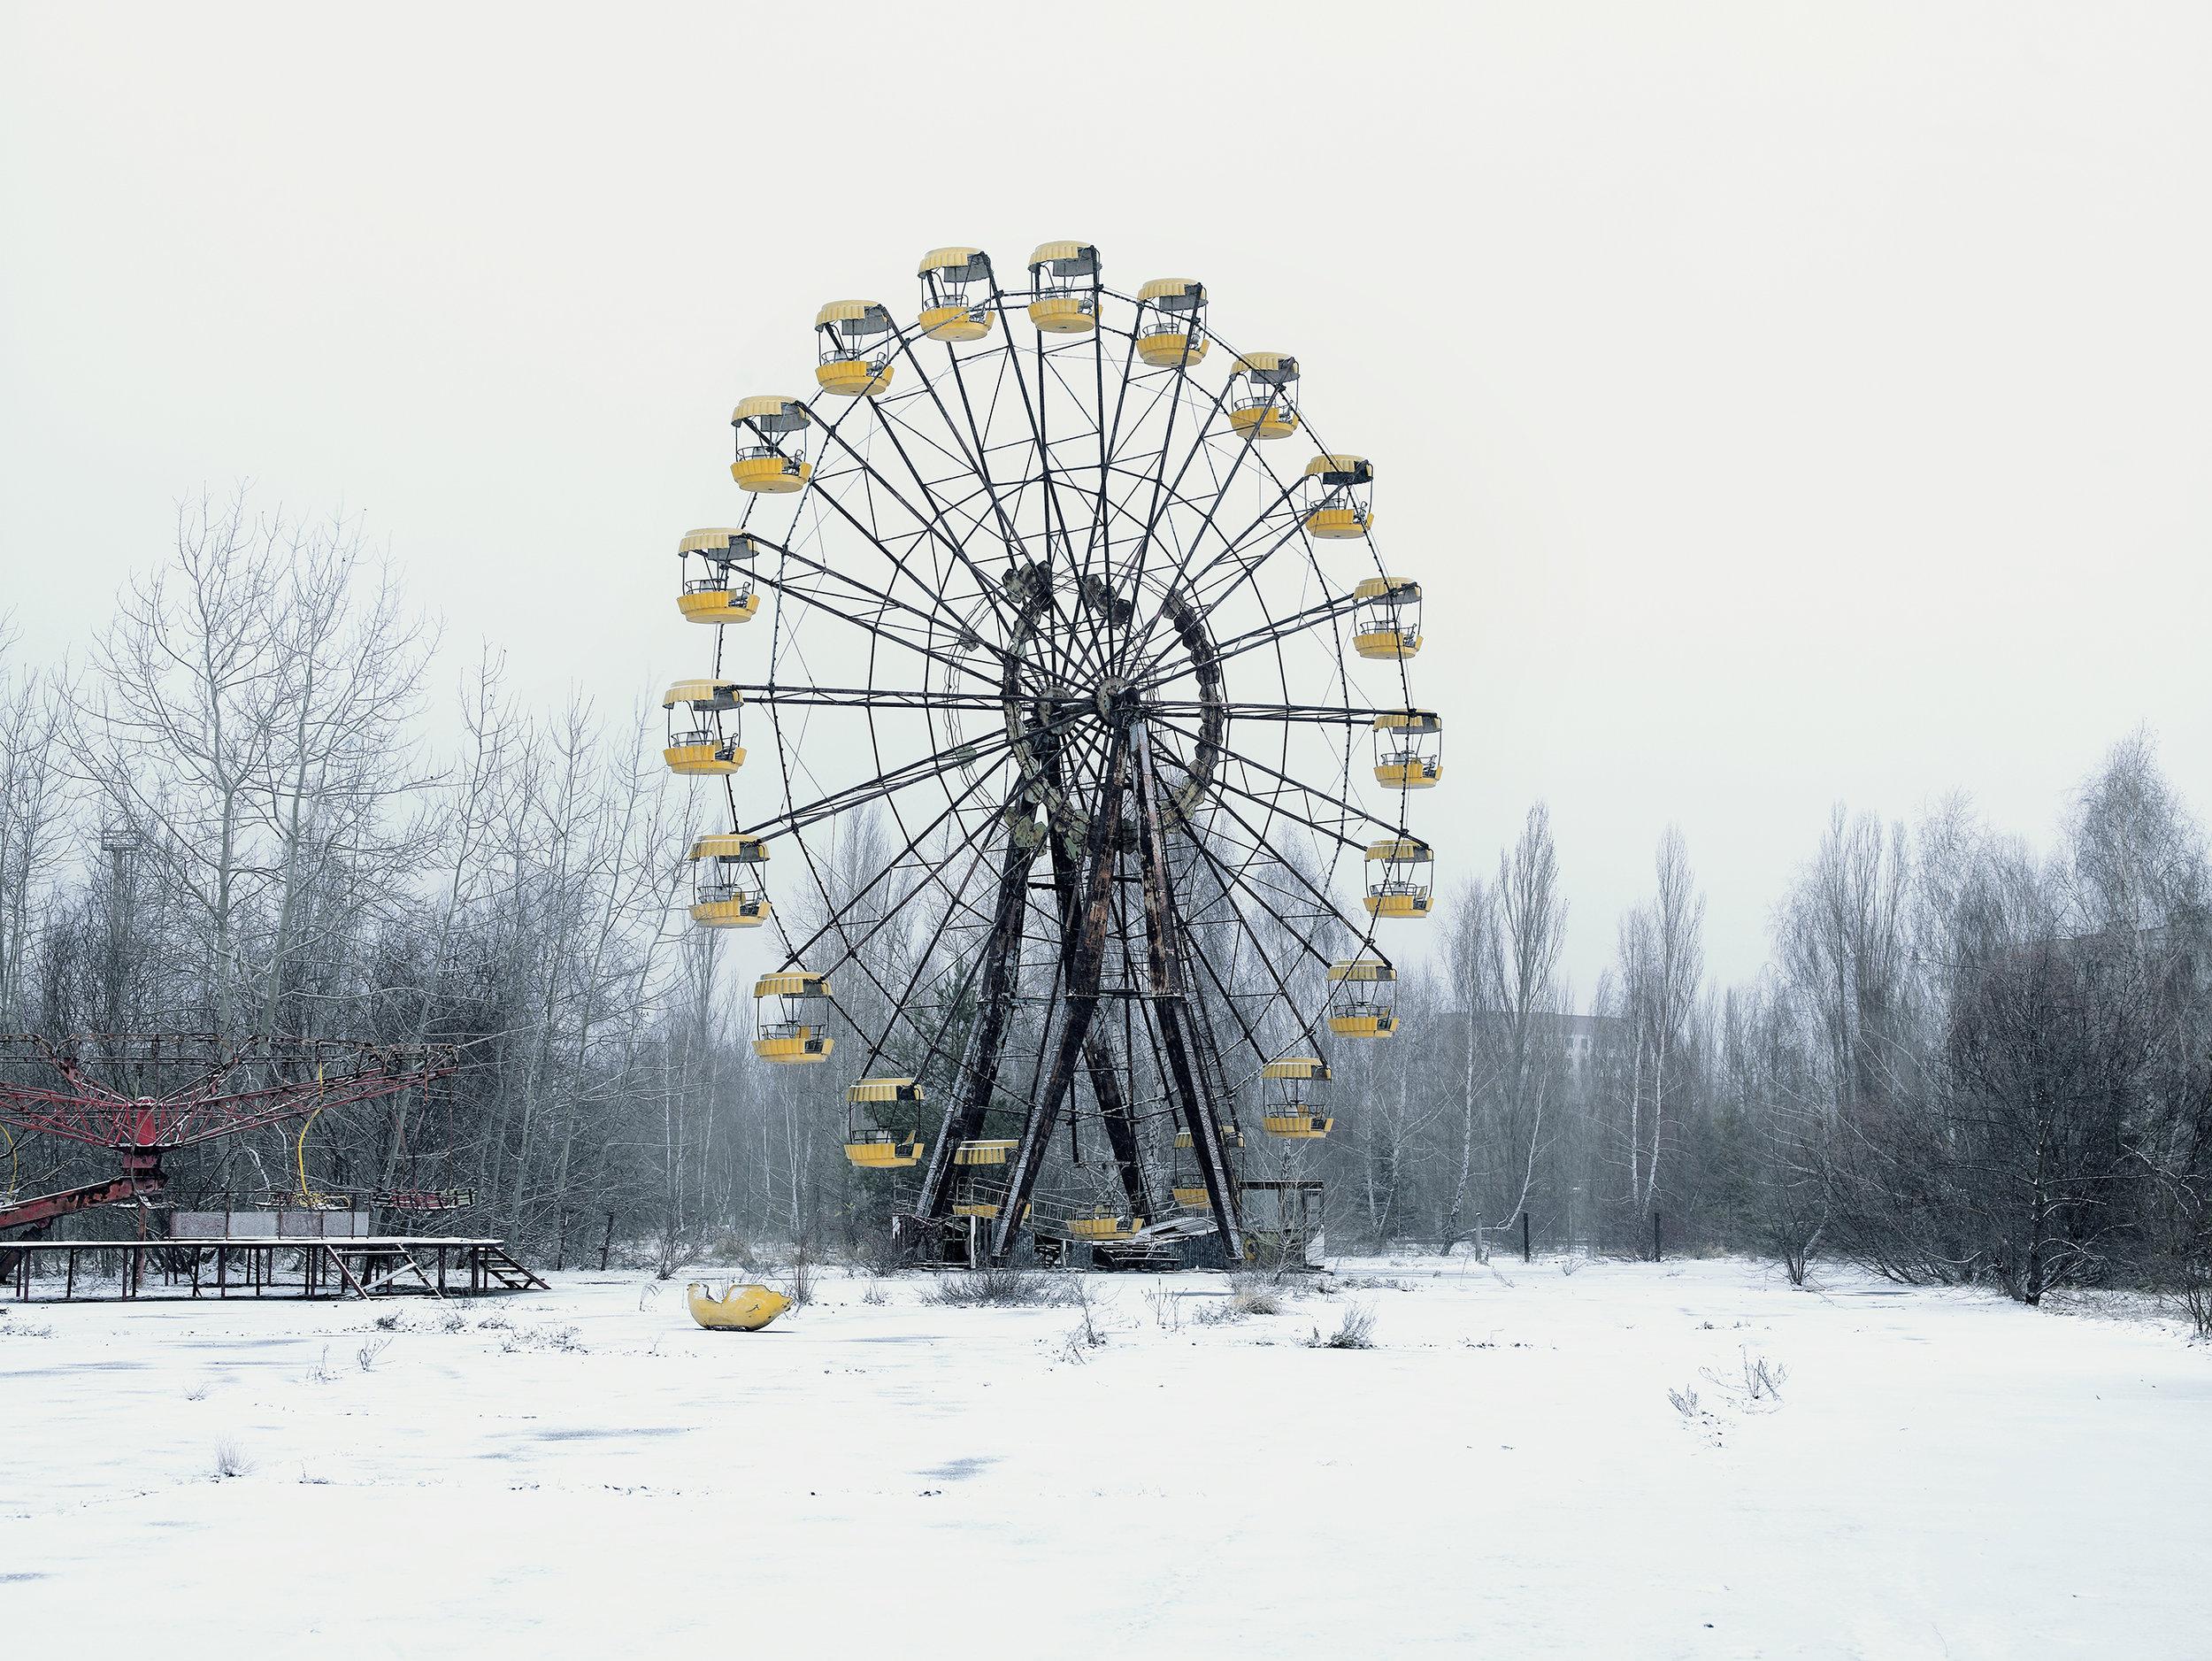 Tchernobyl 1. The great wheel, Prypiat, Ukraine, 2007.